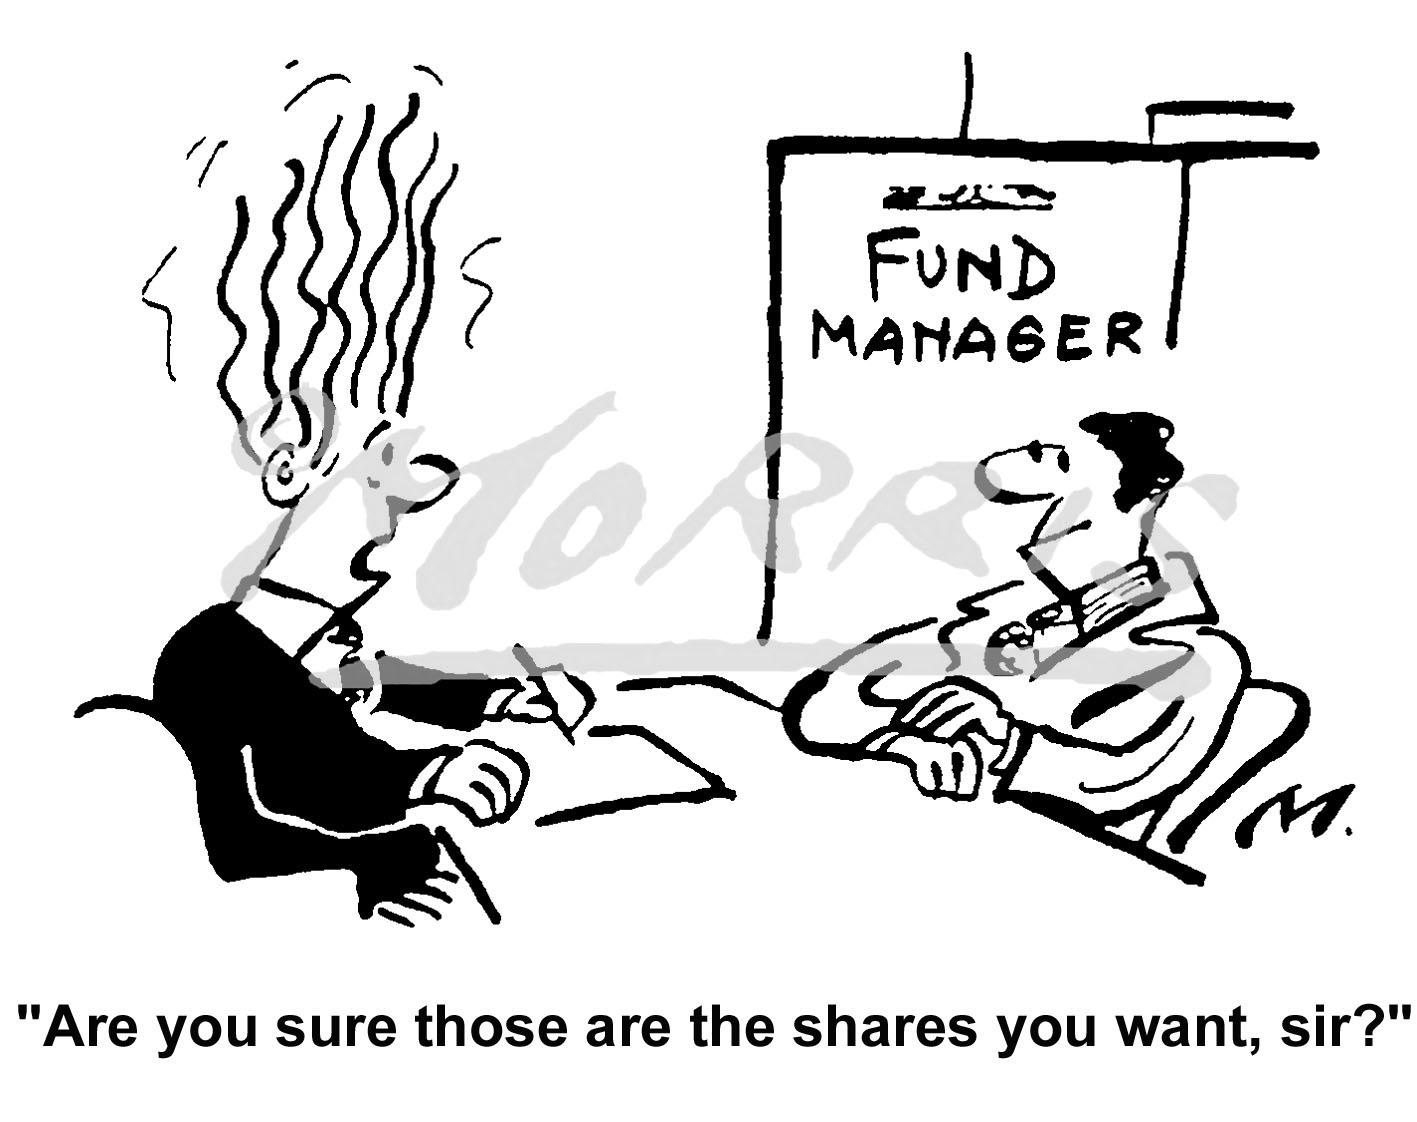 Shares cartoon, Financial cartoon, Fund Manager cartoon –  Ref: 4430bw